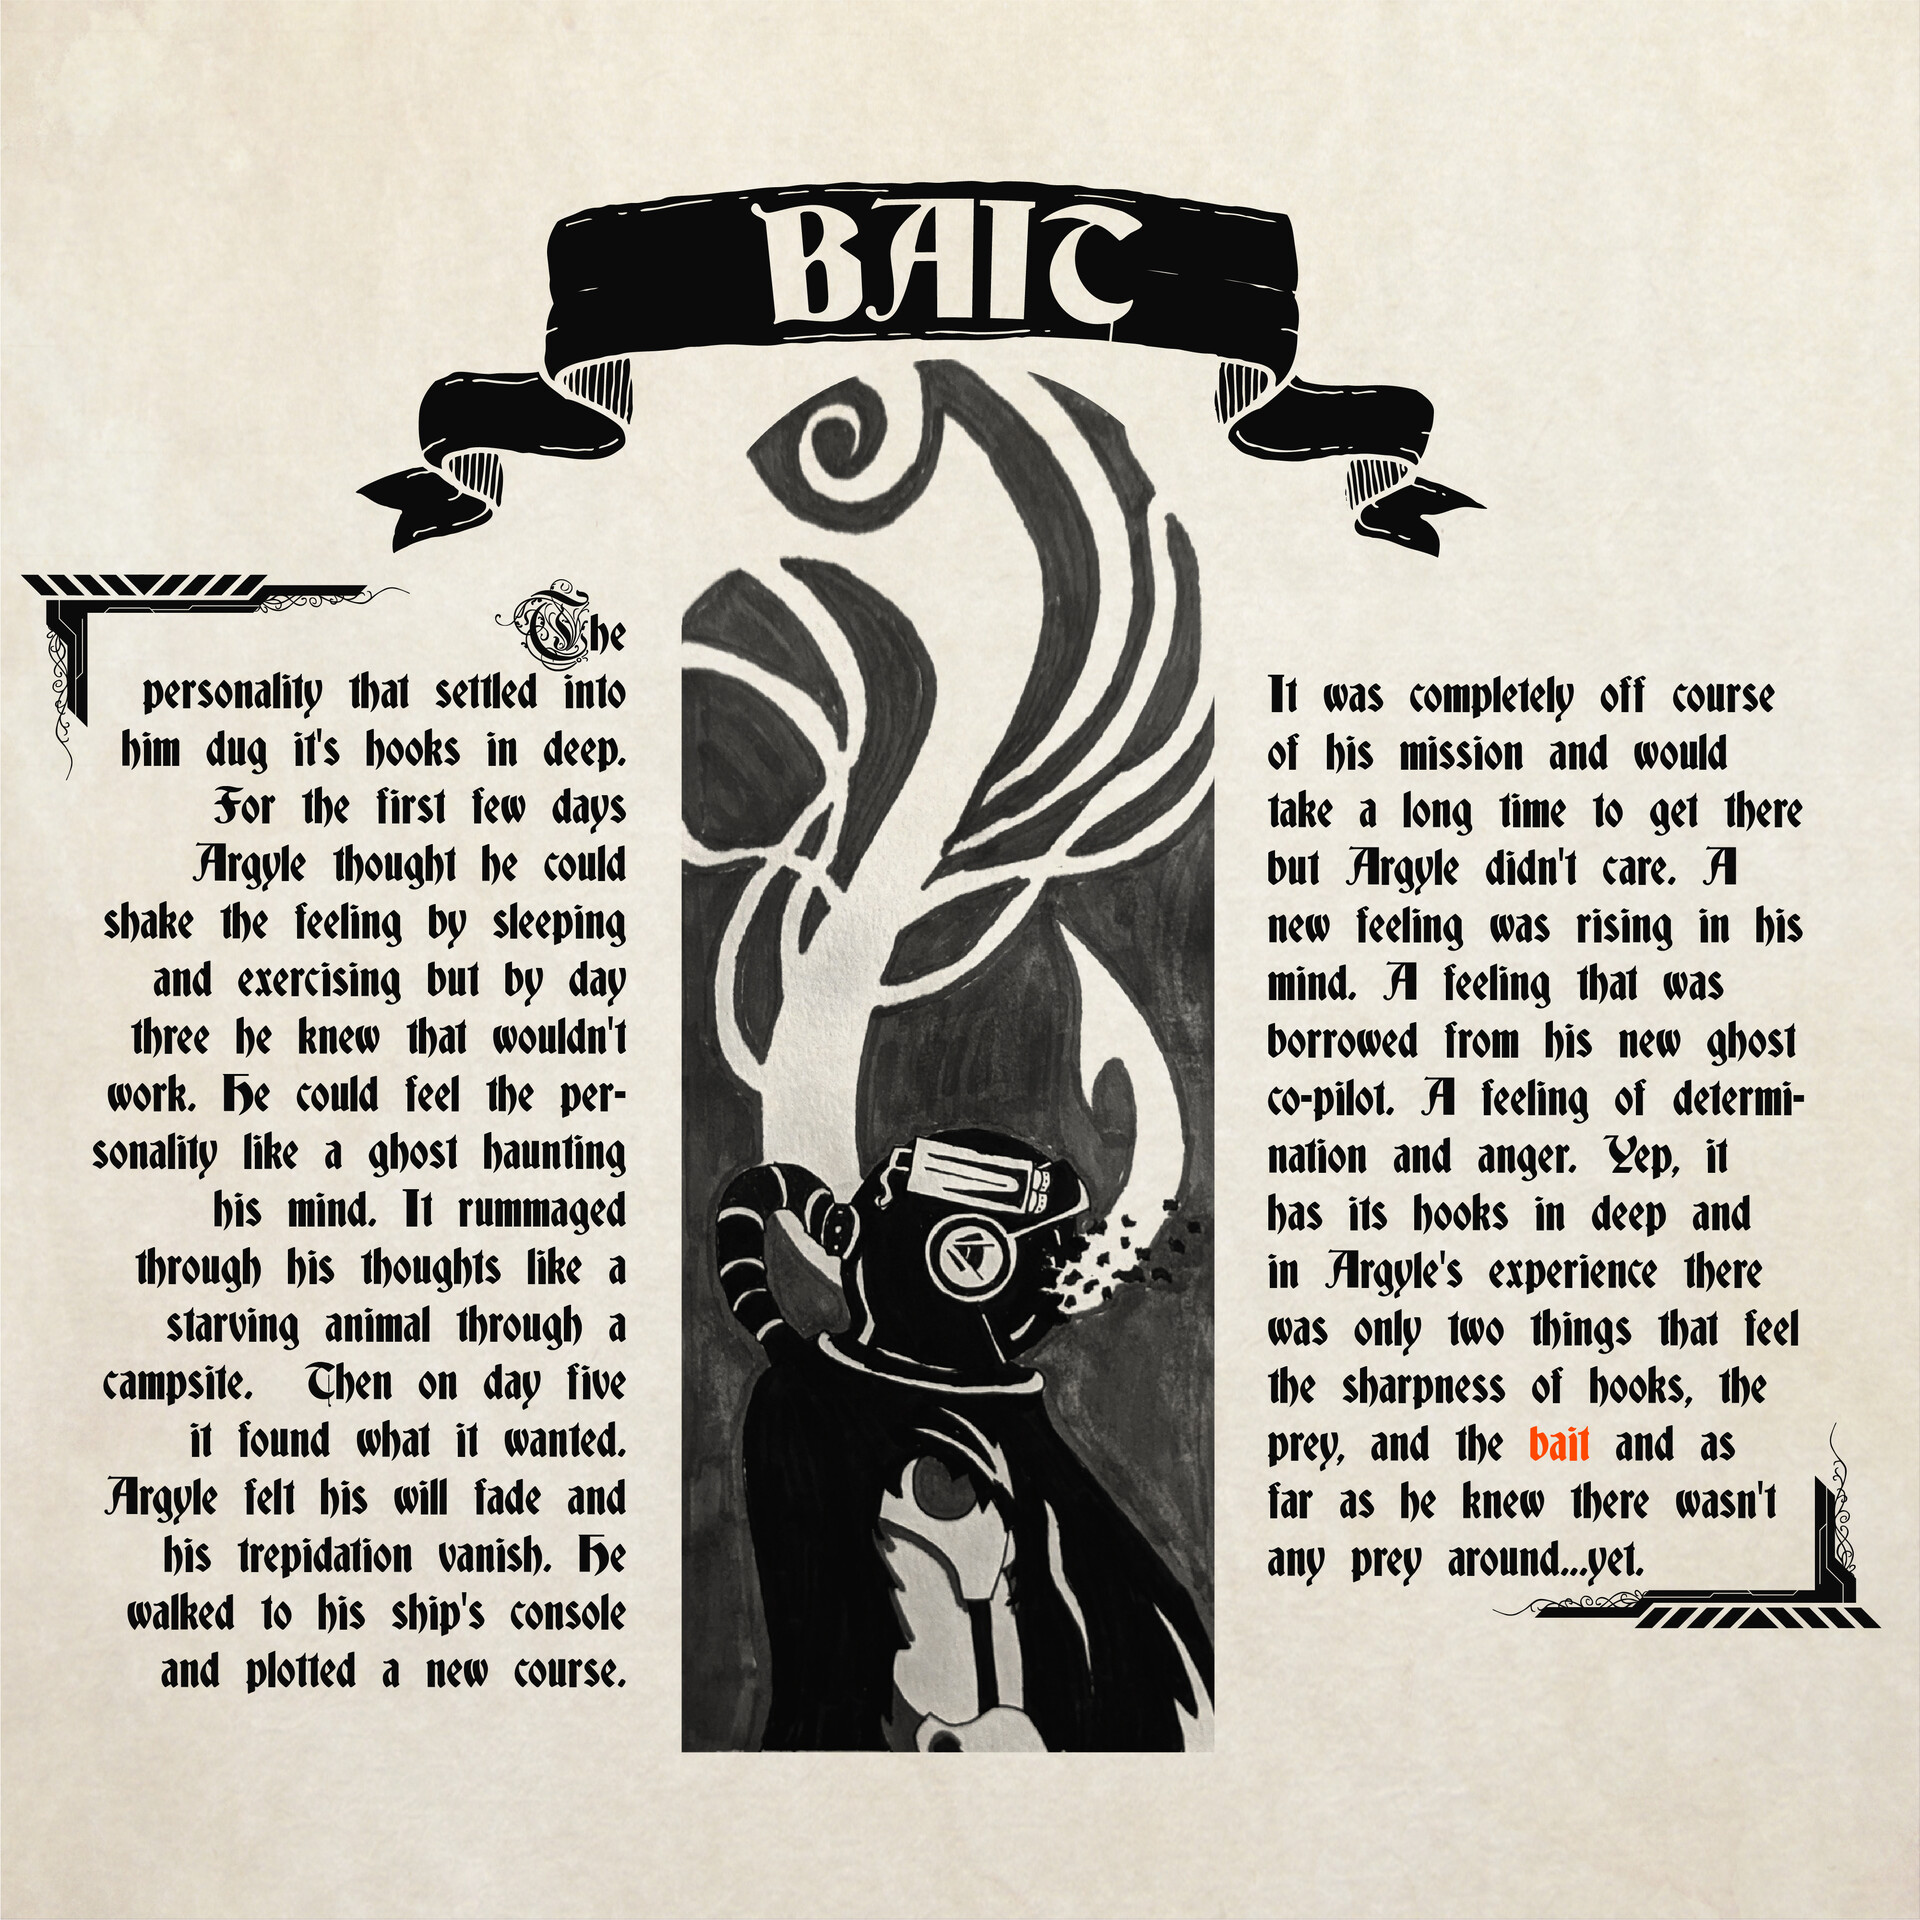 Jacob aybara bait 01